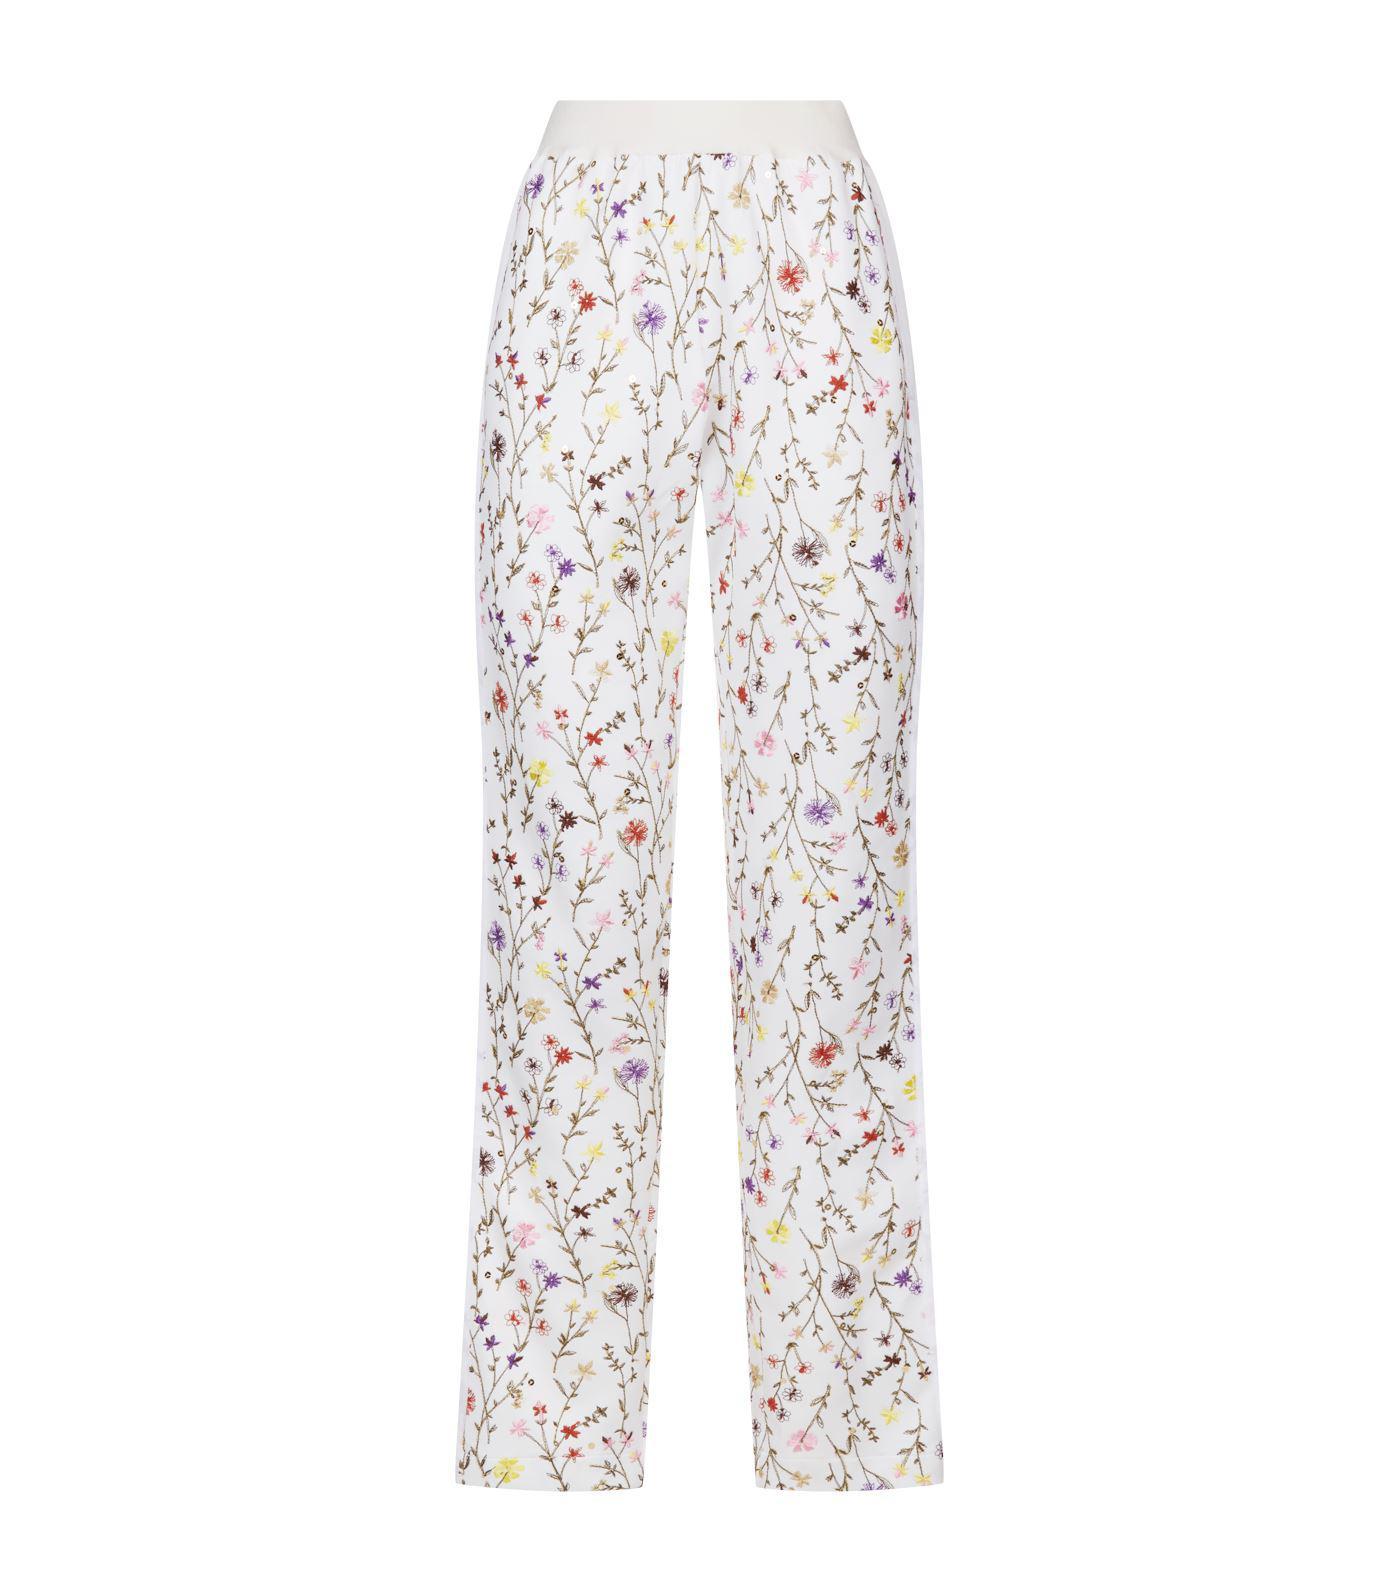 947e45c7a563 Lyst - Giambattista Valli Floral Embroidered Sweatpants in White